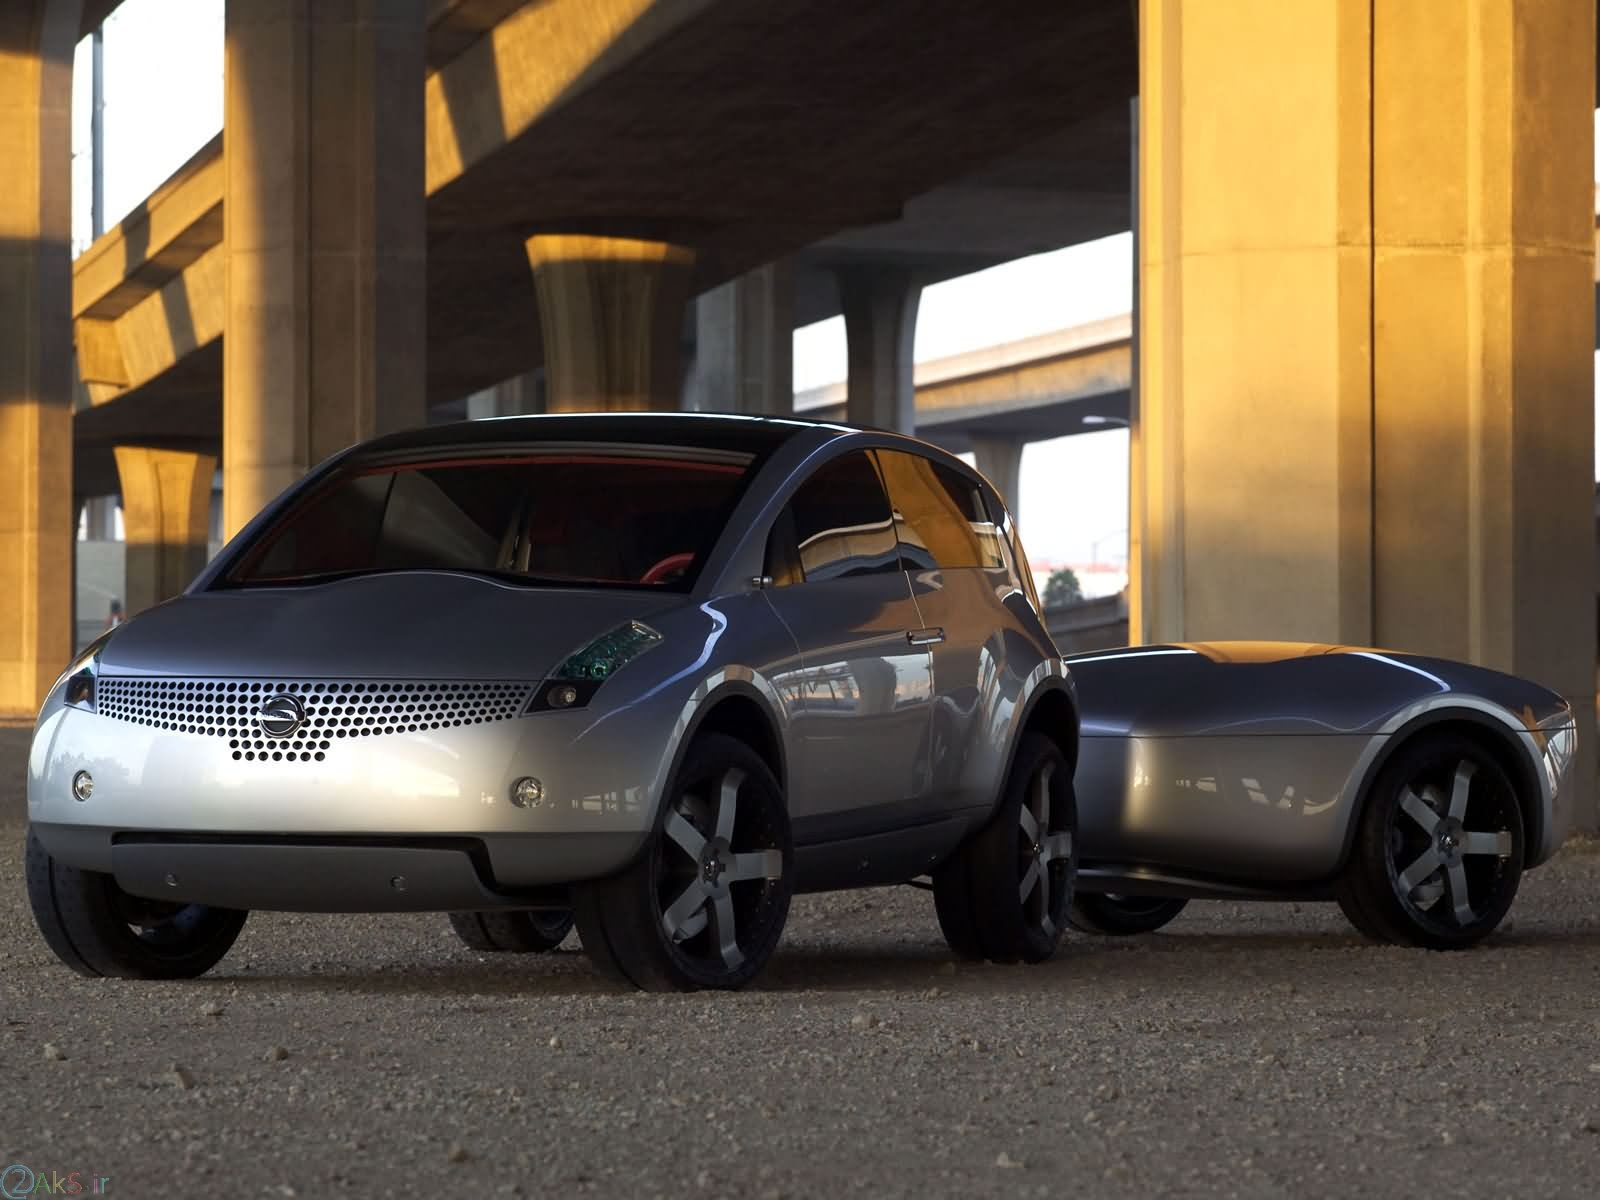 ماشین Nissan Actic